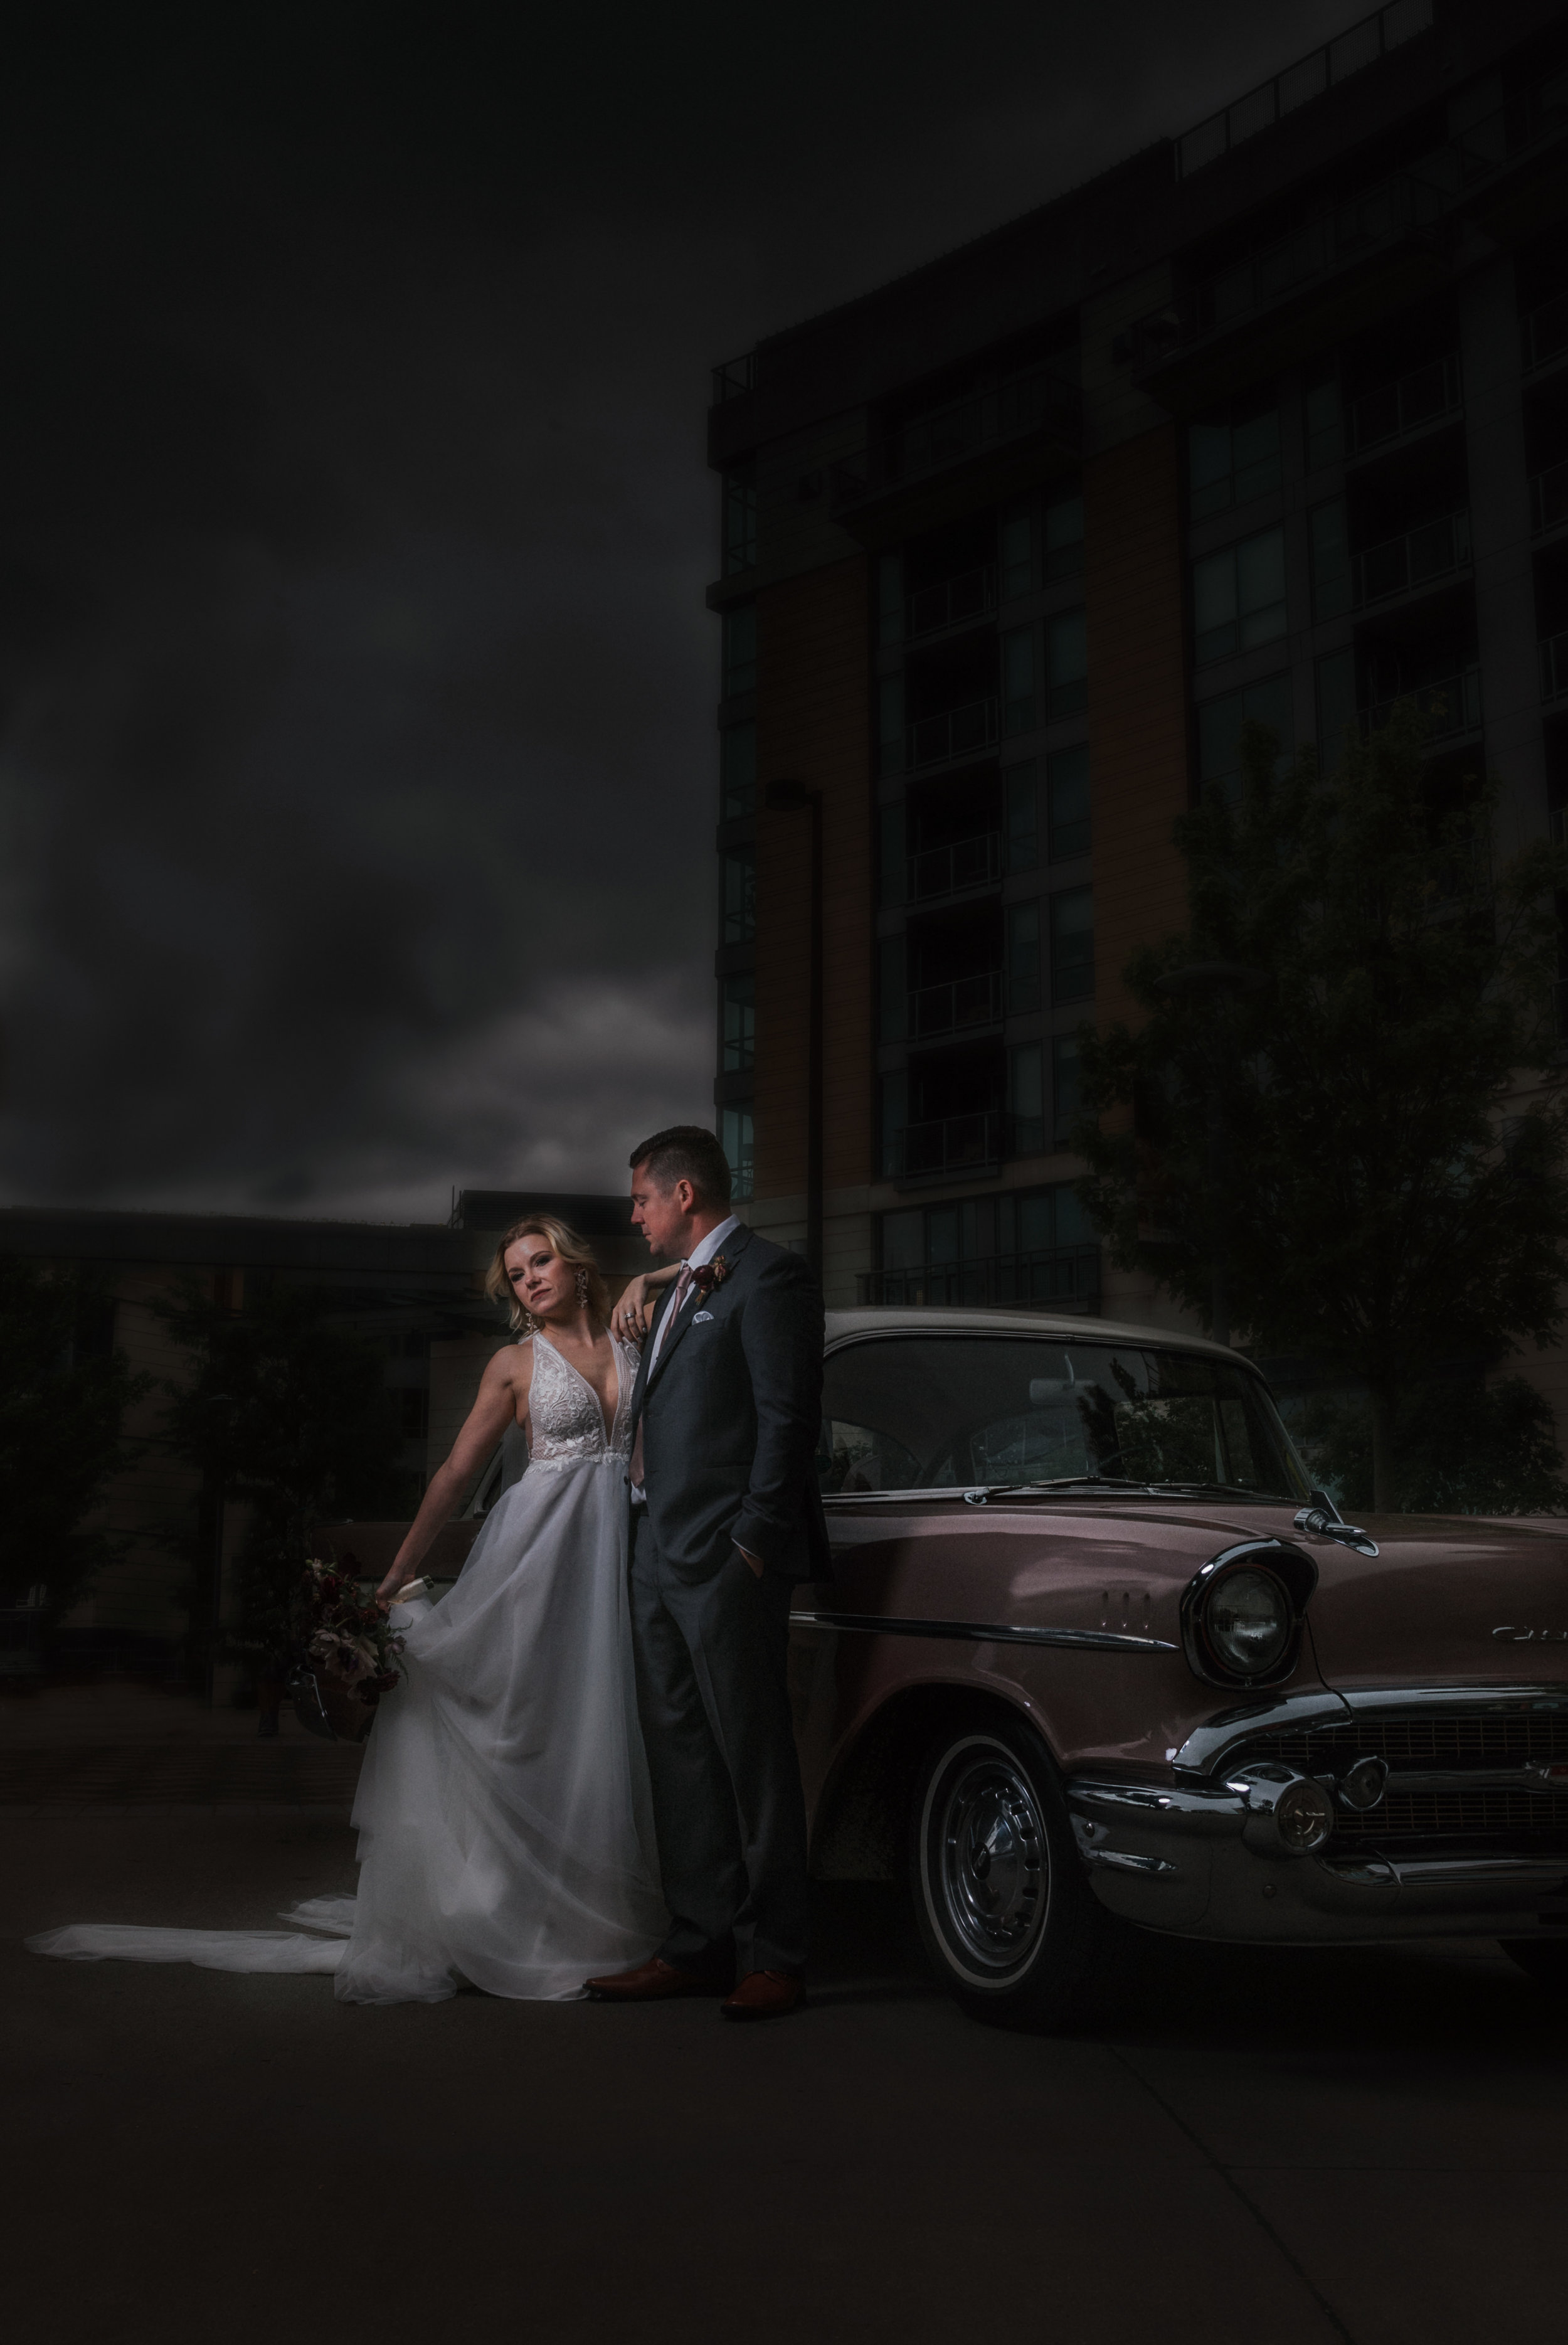 164 tiny-luxe-weddings-omaha-nebraska-midwest-empire-room.jpg